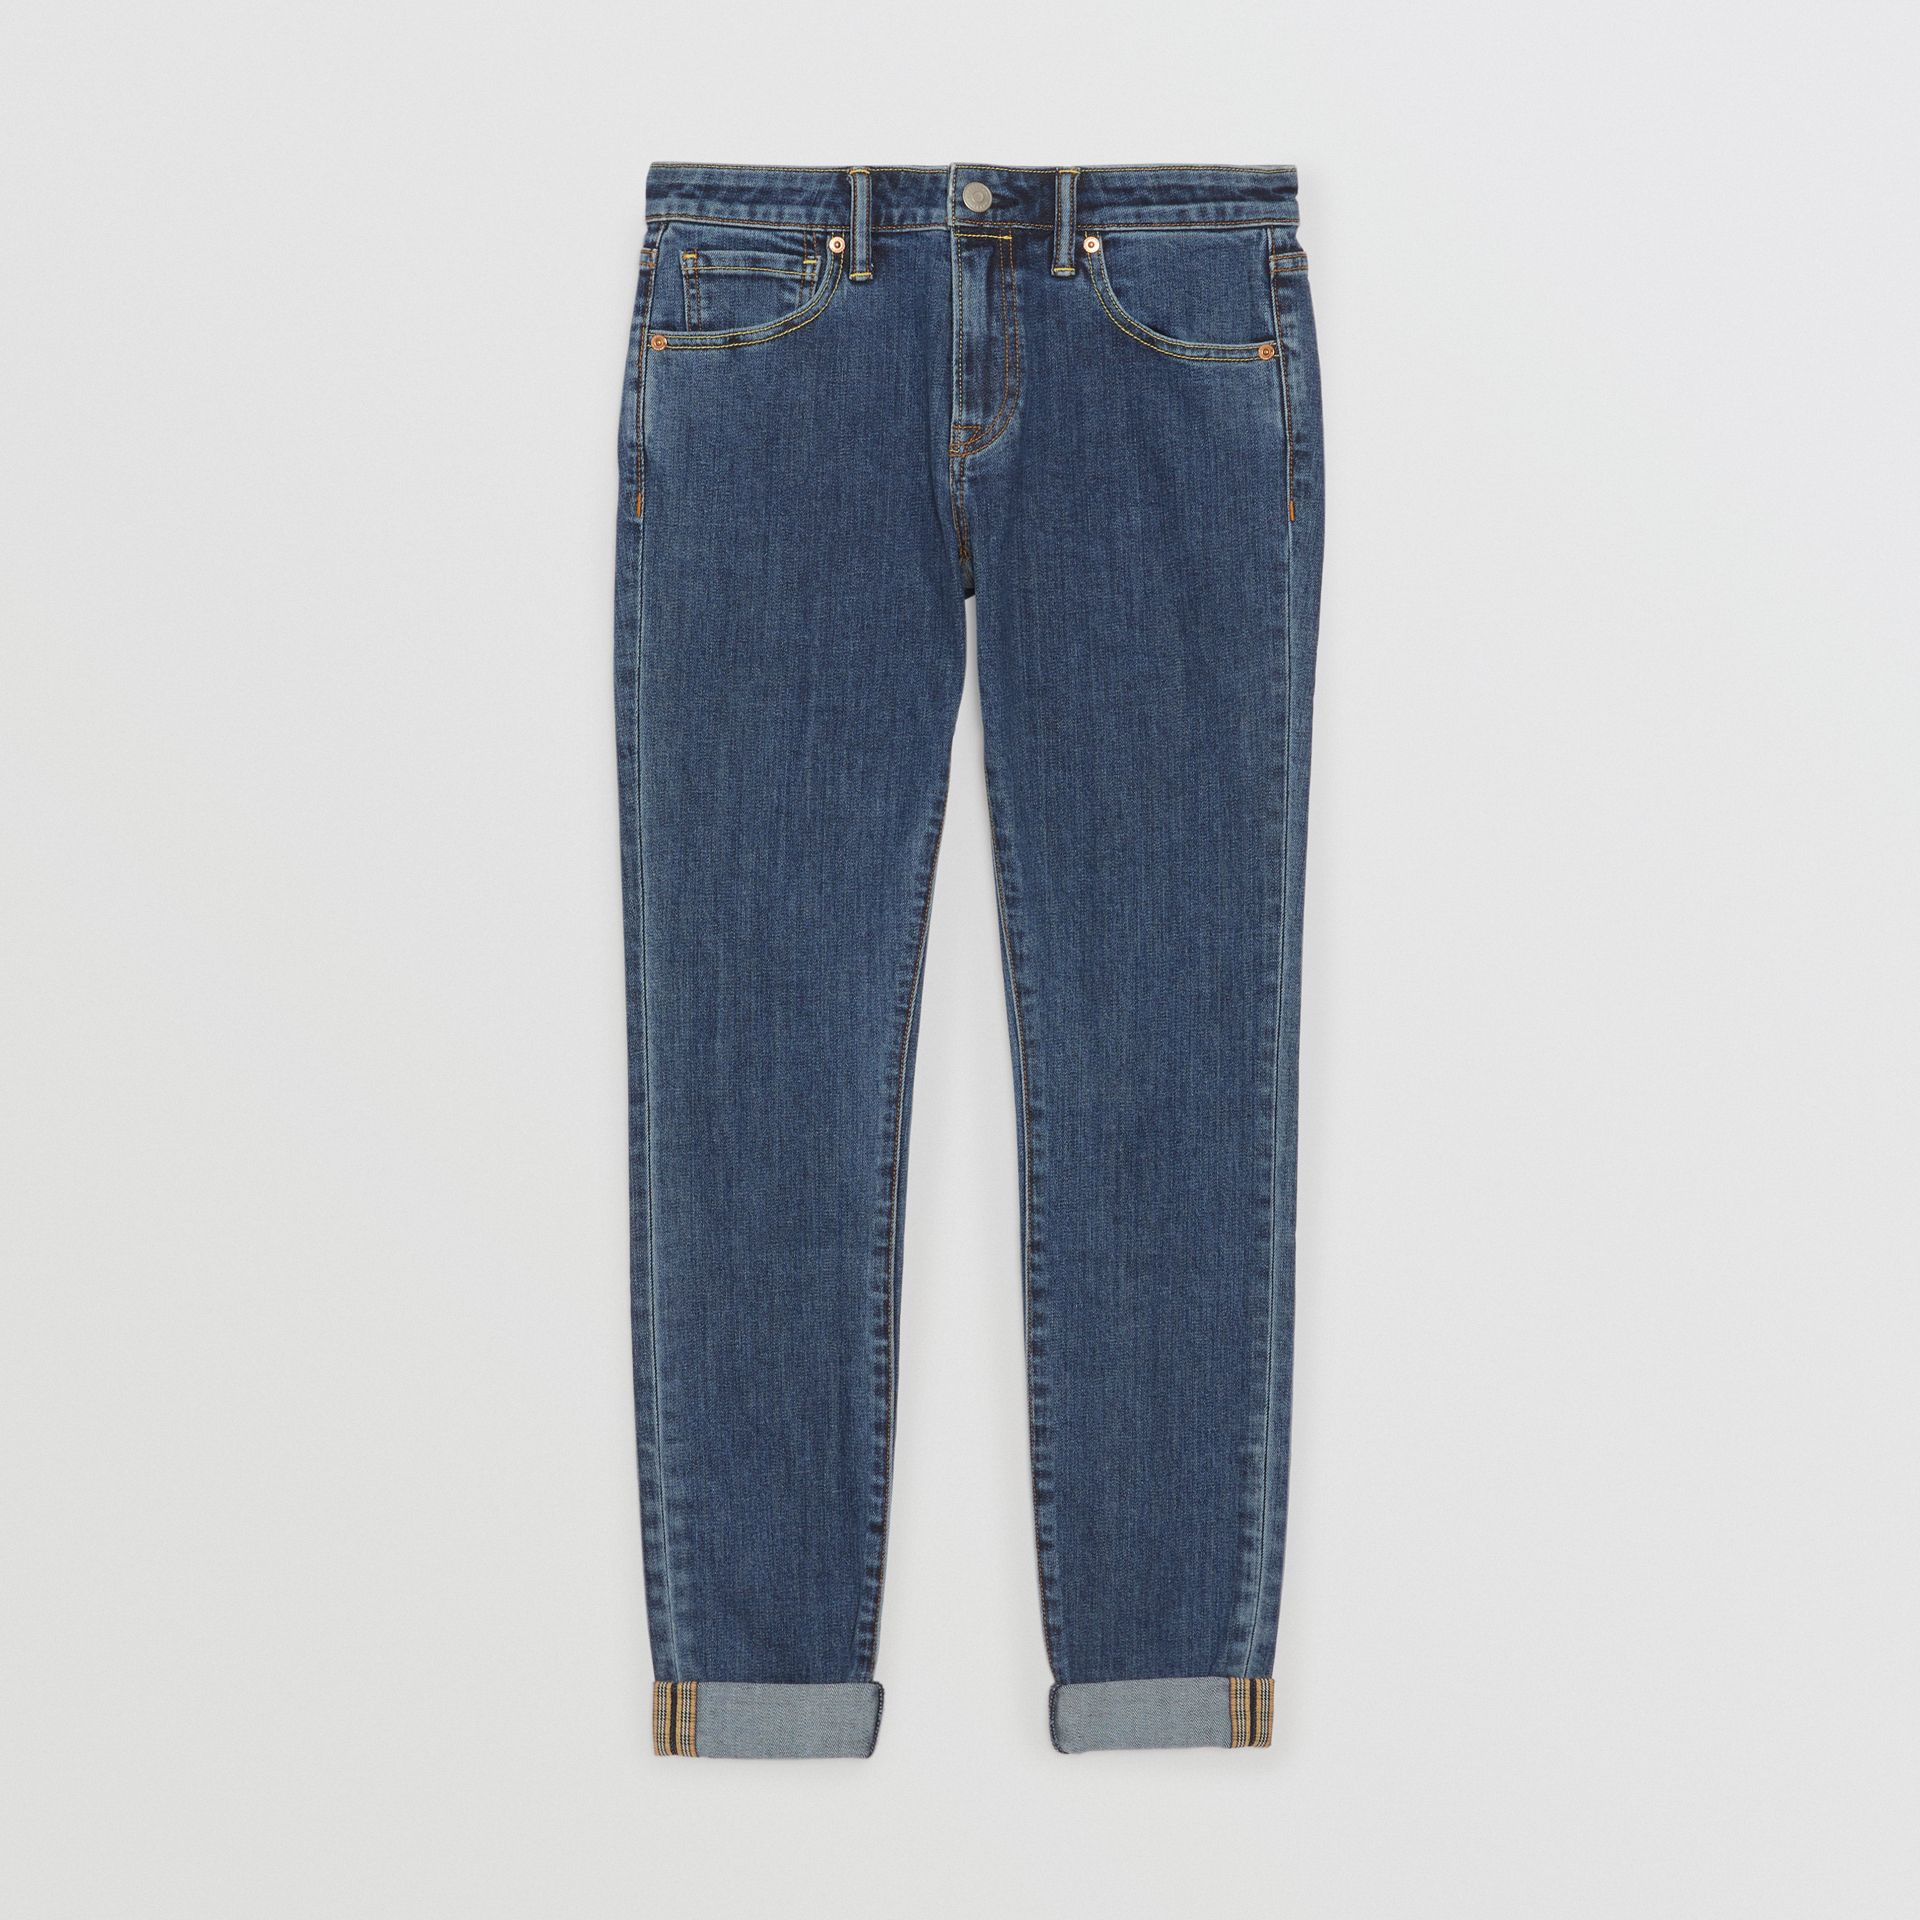 Skinny Fit Japanese Denim Jeans in Blue - Women | Burberry Australia - gallery image 3